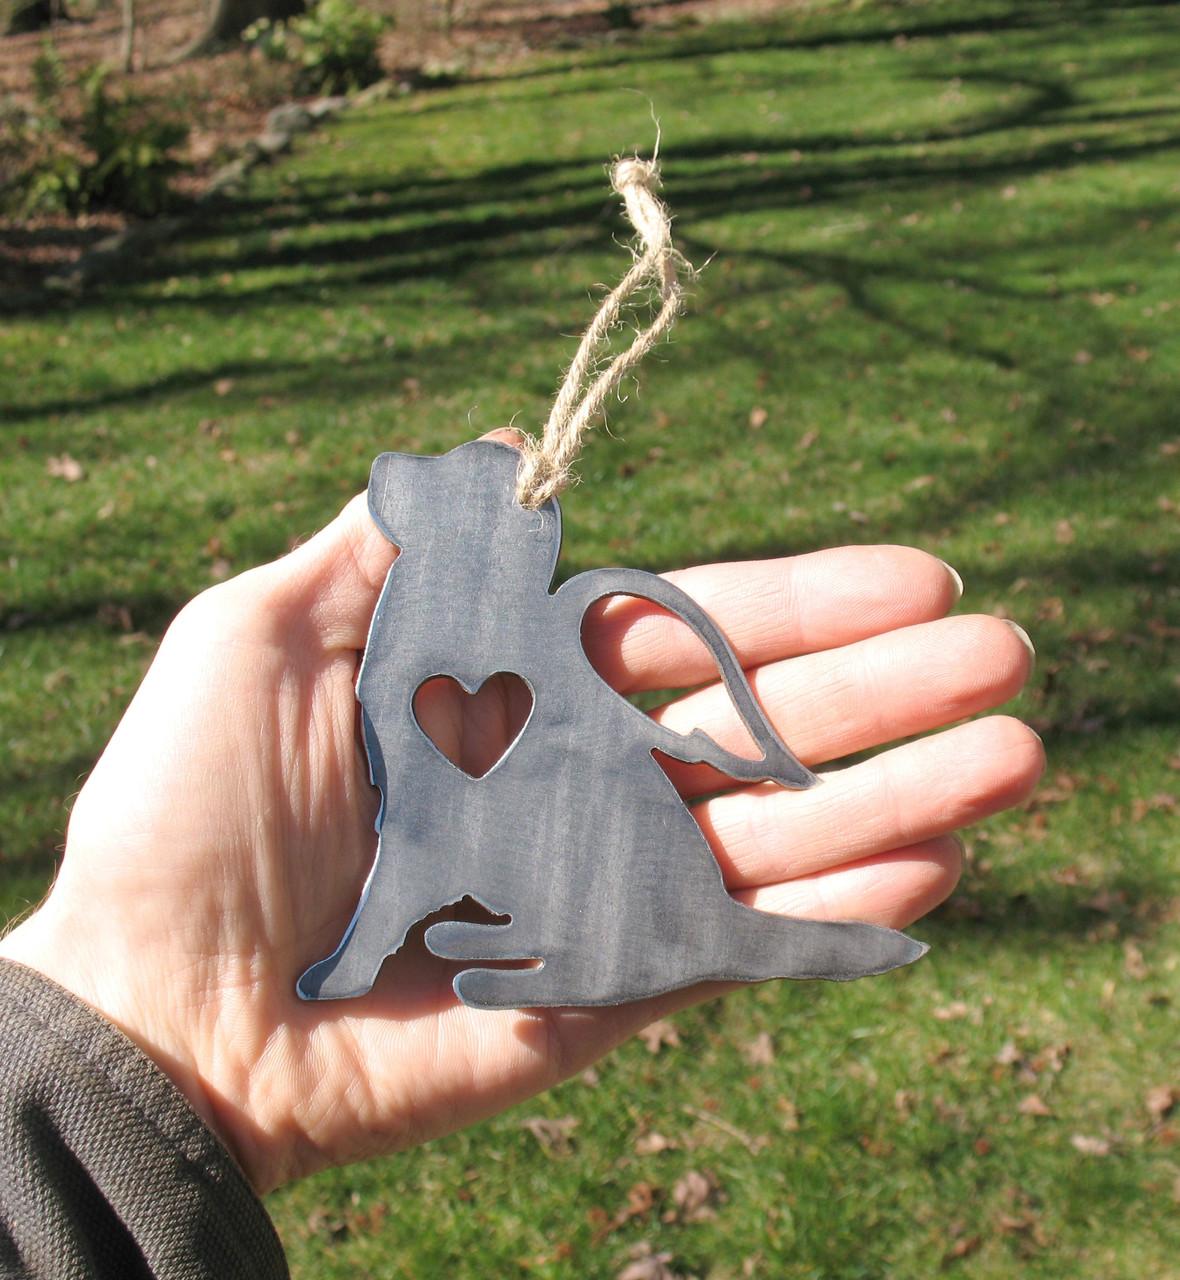 Golden Retriever Dog Ornament 2 Pet Memorial W/ Angel Wings - Pet Loss Dog Sympathy Remembrance Gift - Metal Dog Christmas Ornament